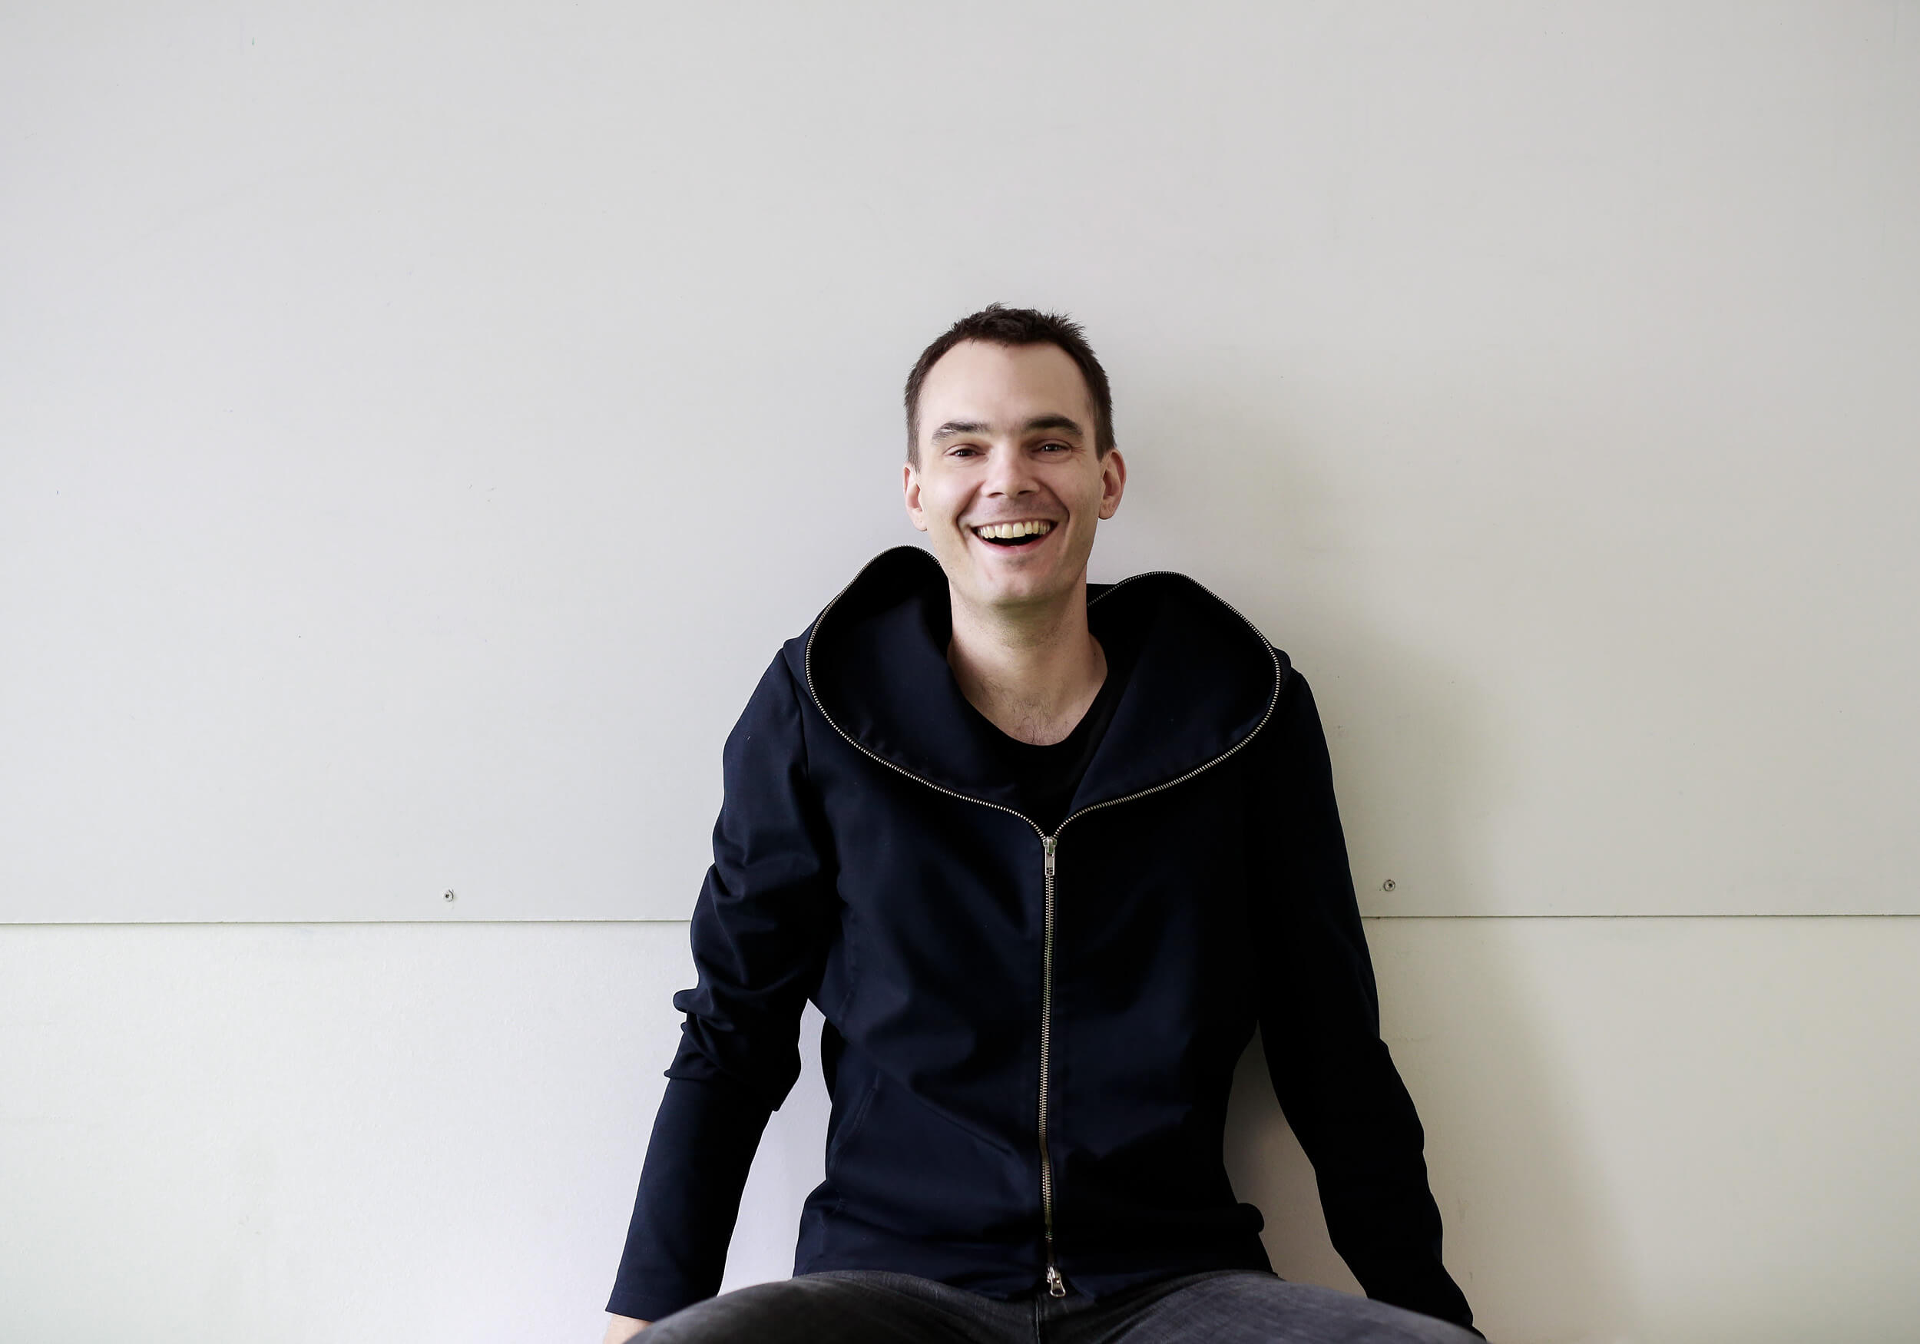 Meet the team: Florian Dorfbauer, CEO